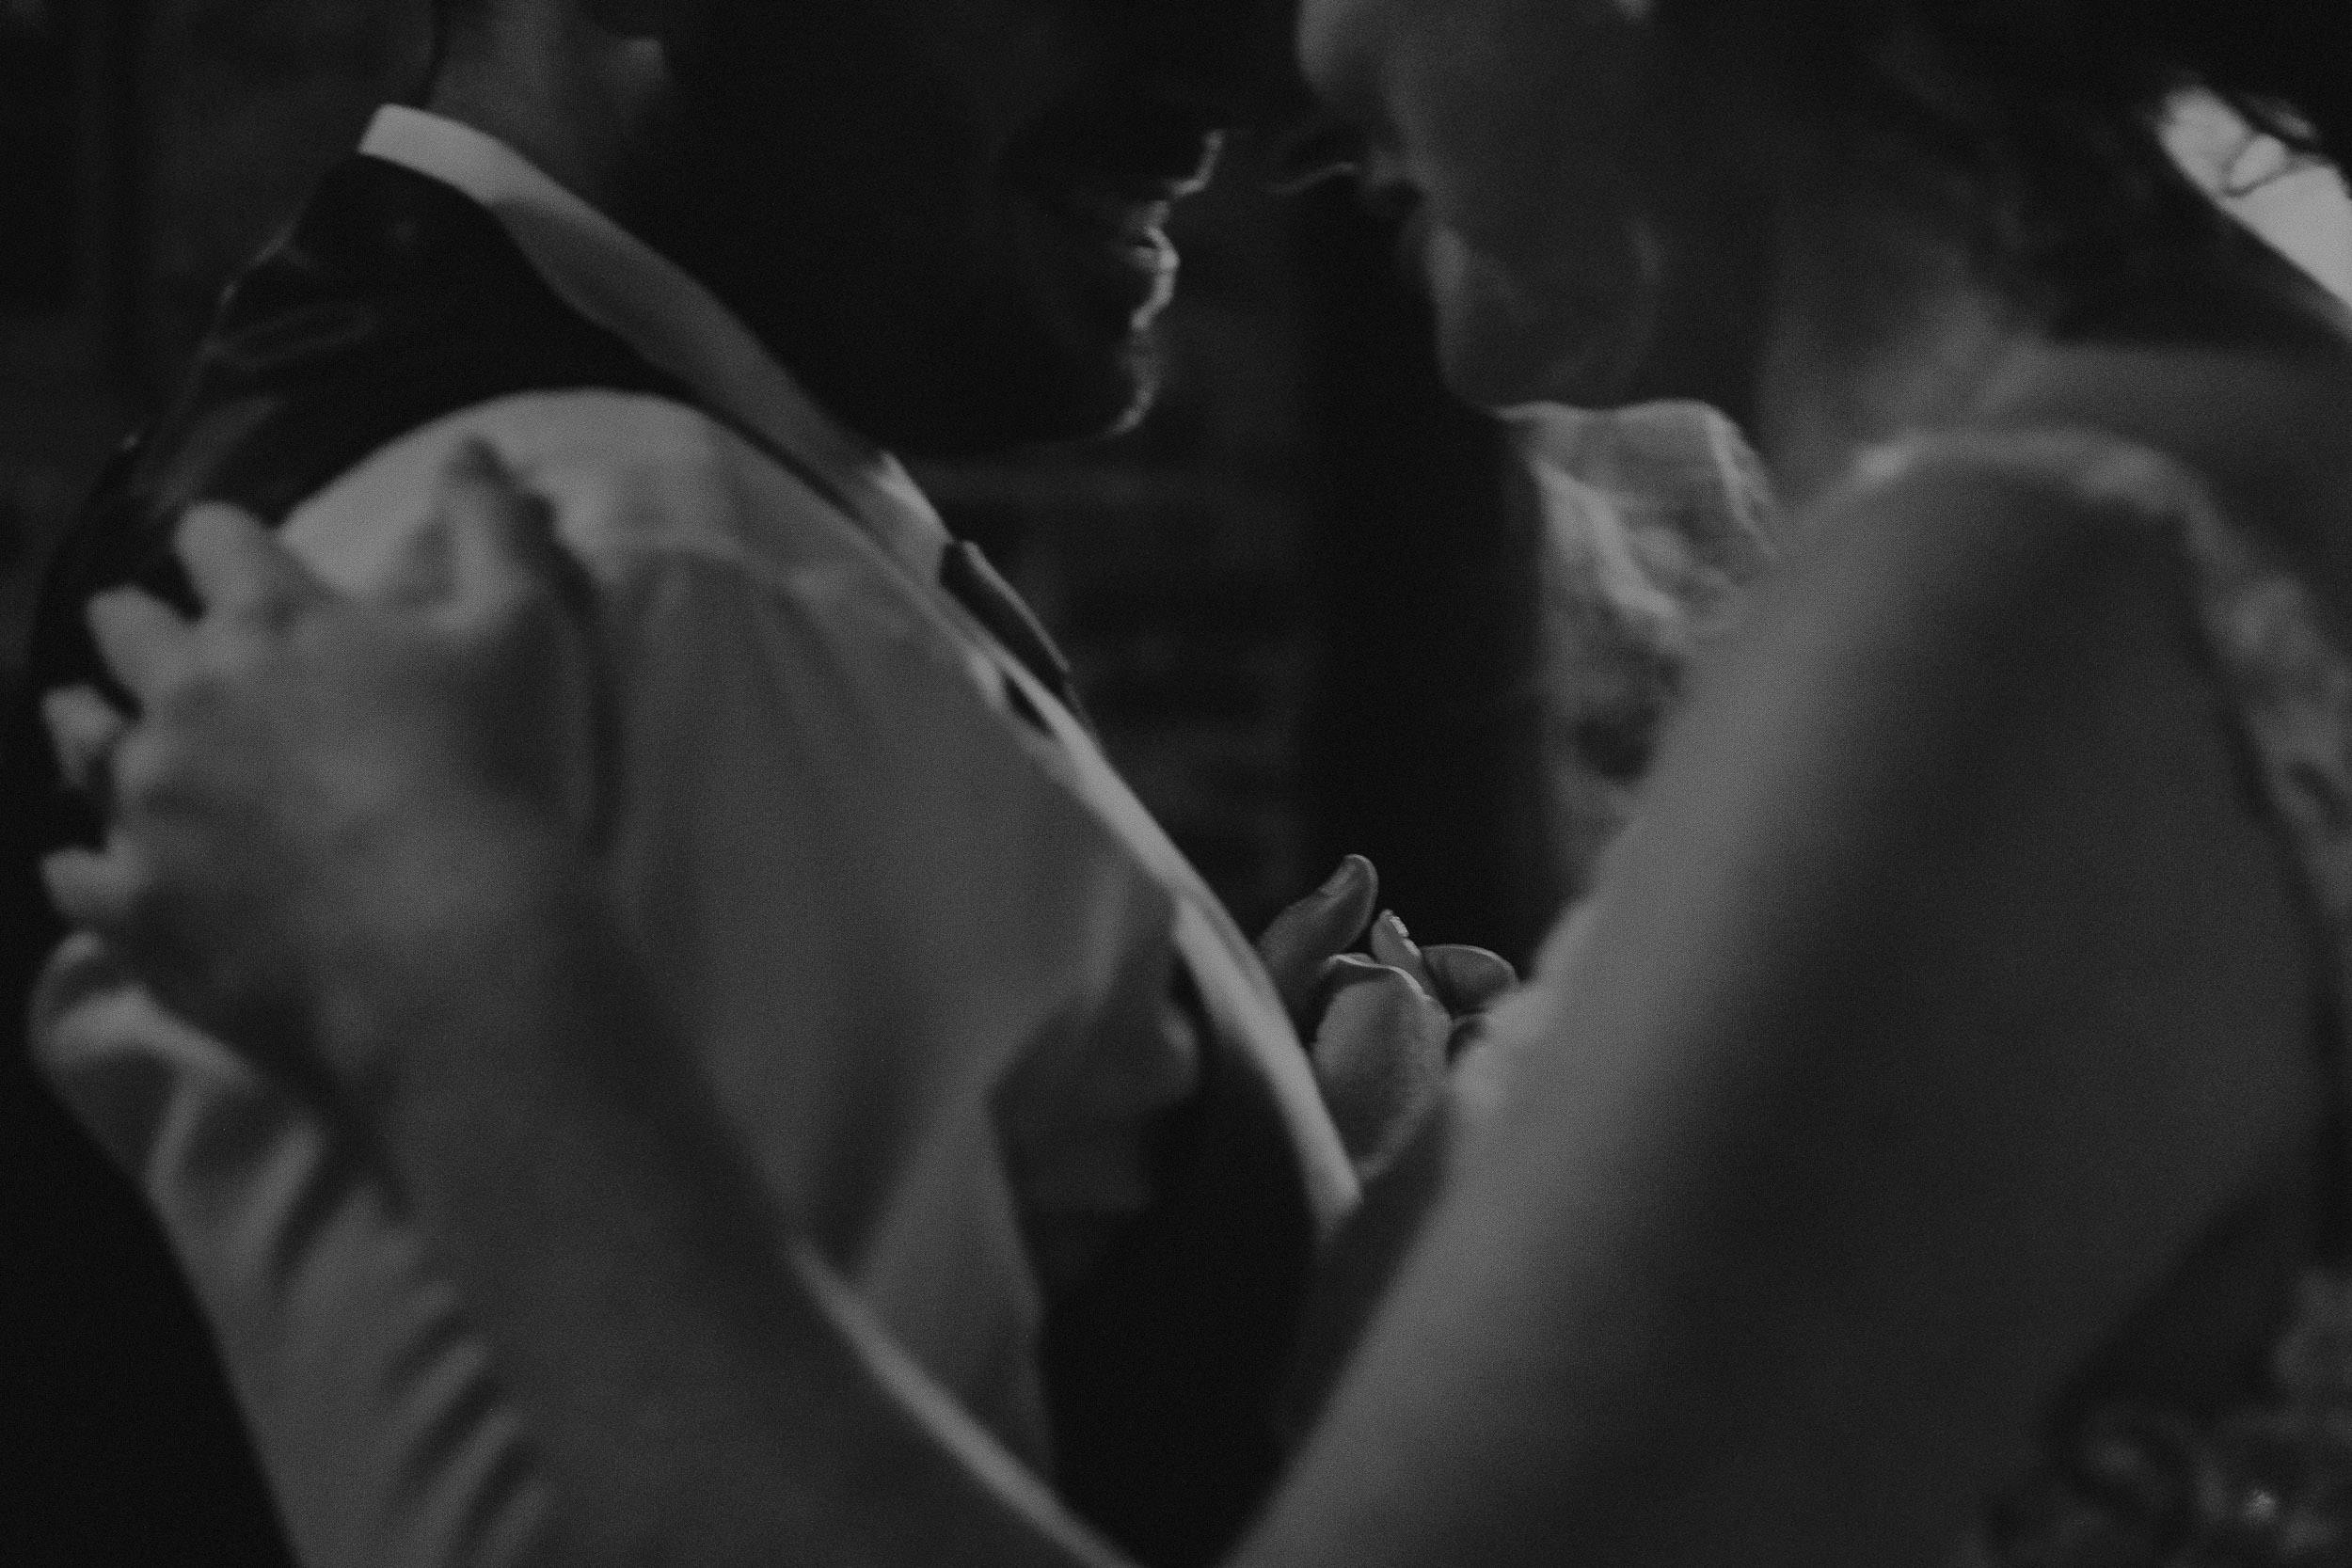 sav & mike_elopement wedding photography_kings & thieves_blog (24 of 44).jpg